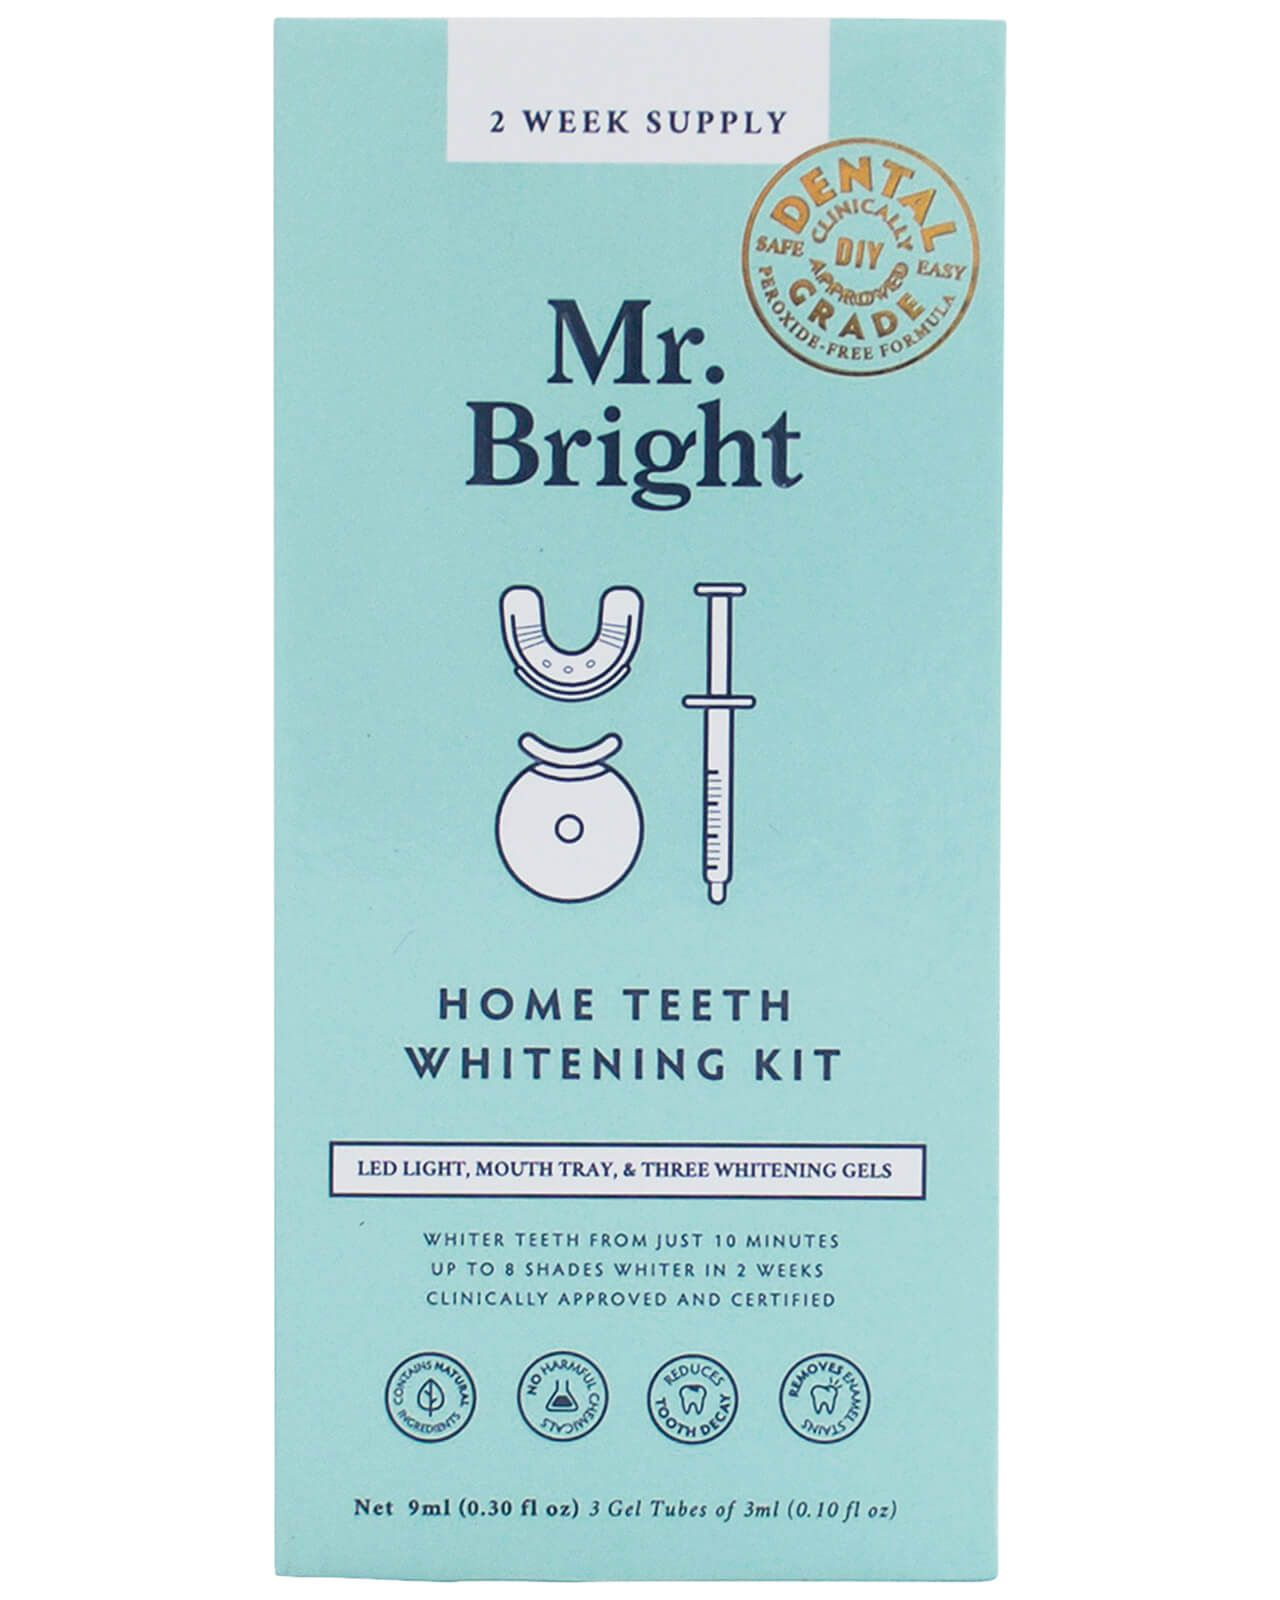 Mr Bright Home Teeth Whitening Kit